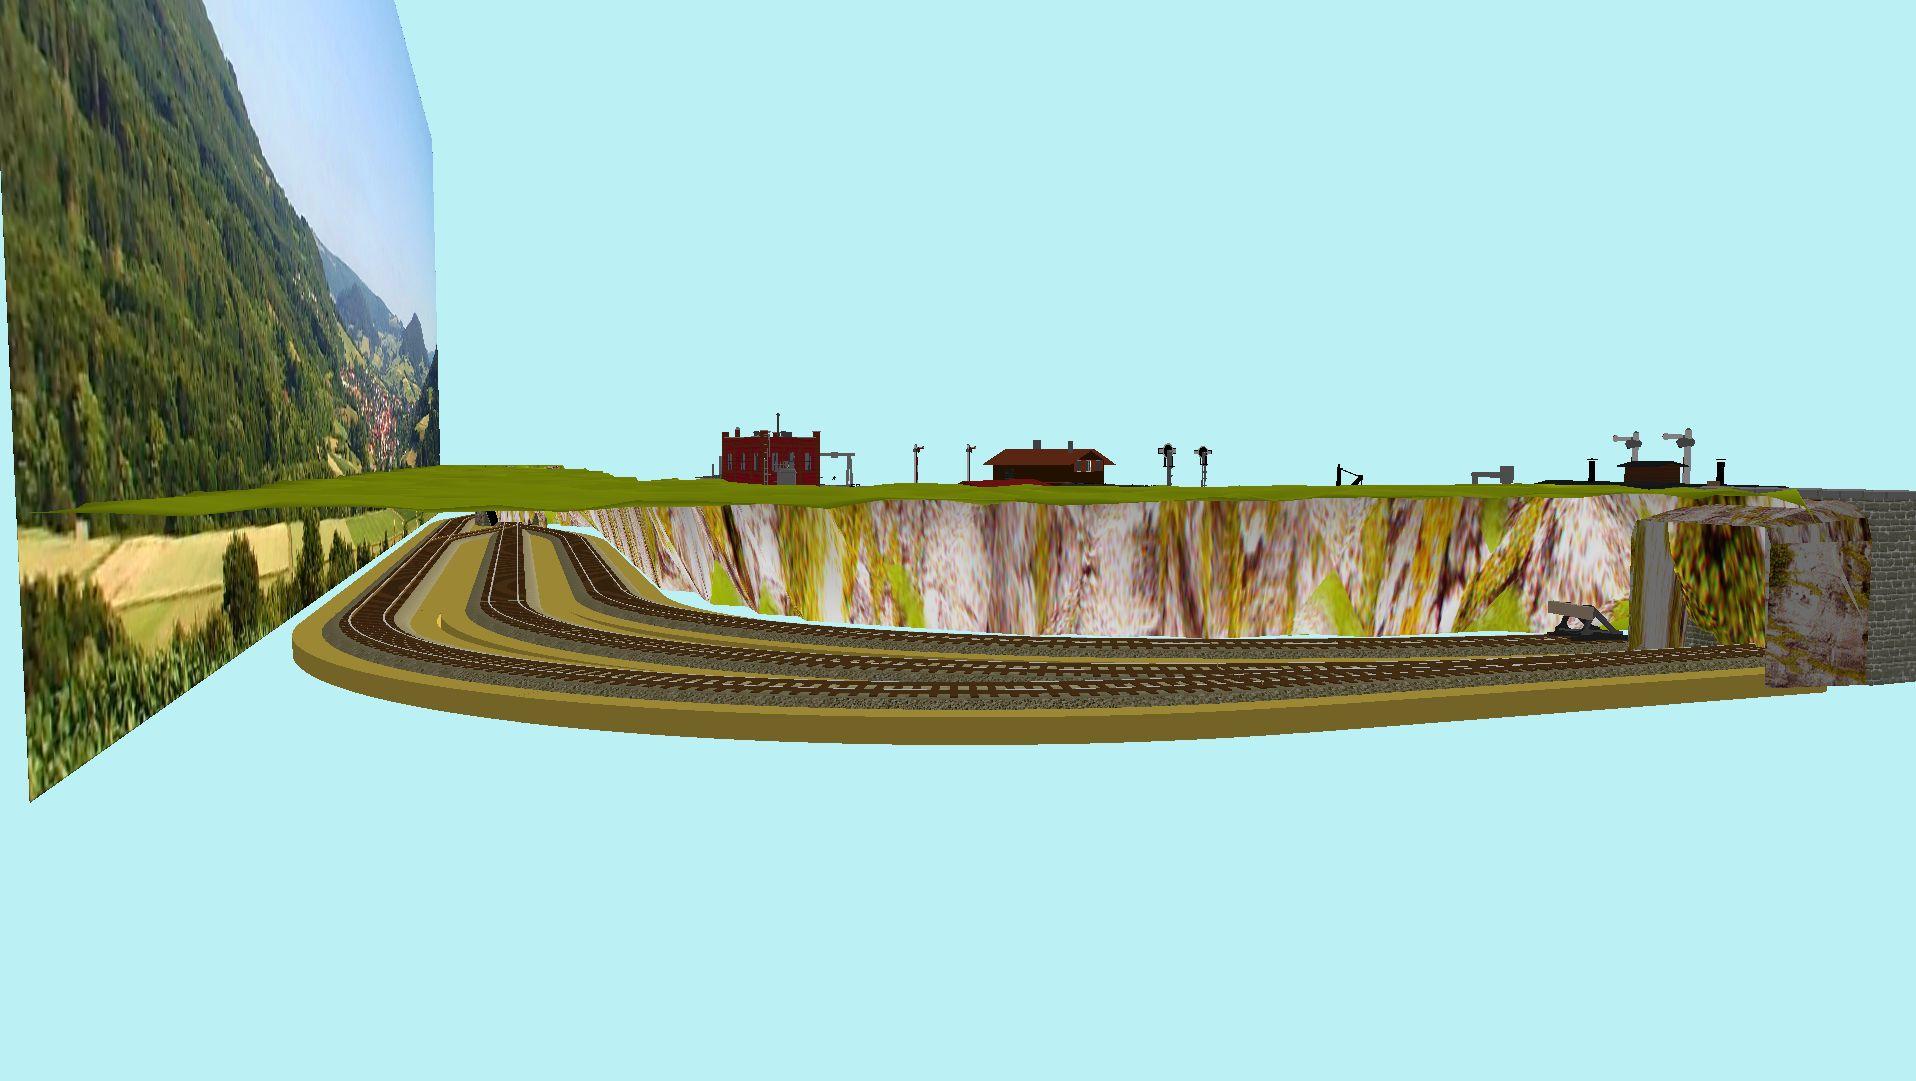 'ALBA Modellbahnpraxis' Band 1, Plan 5 Amp-1_5_62lj7c